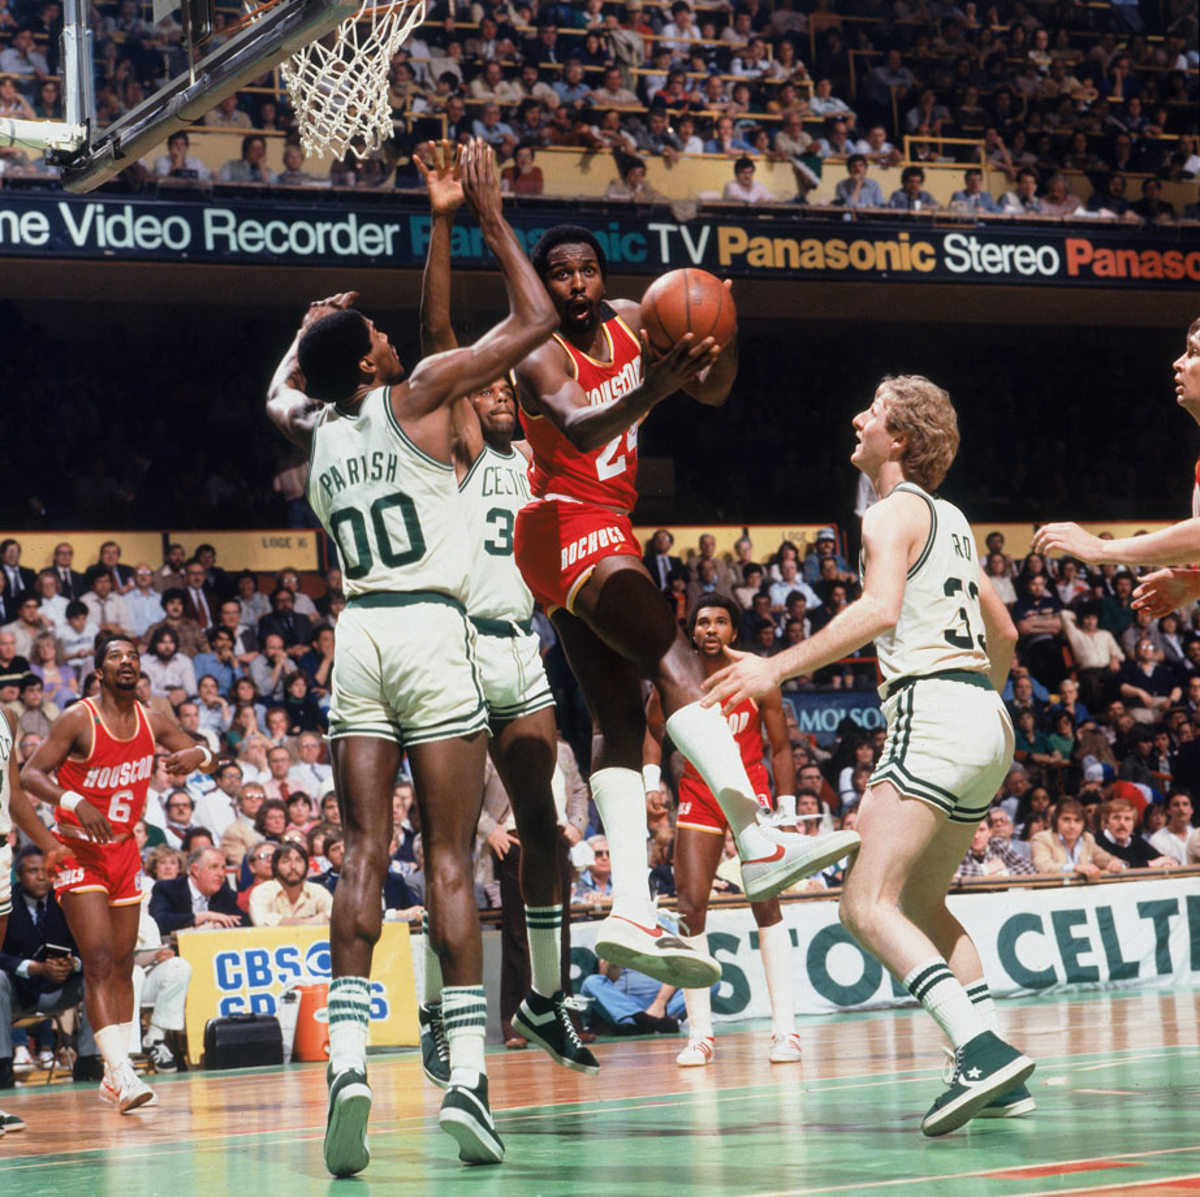 1981-Moses-Malone-Robert-Parish-Larry-Bird-079005630.jpg